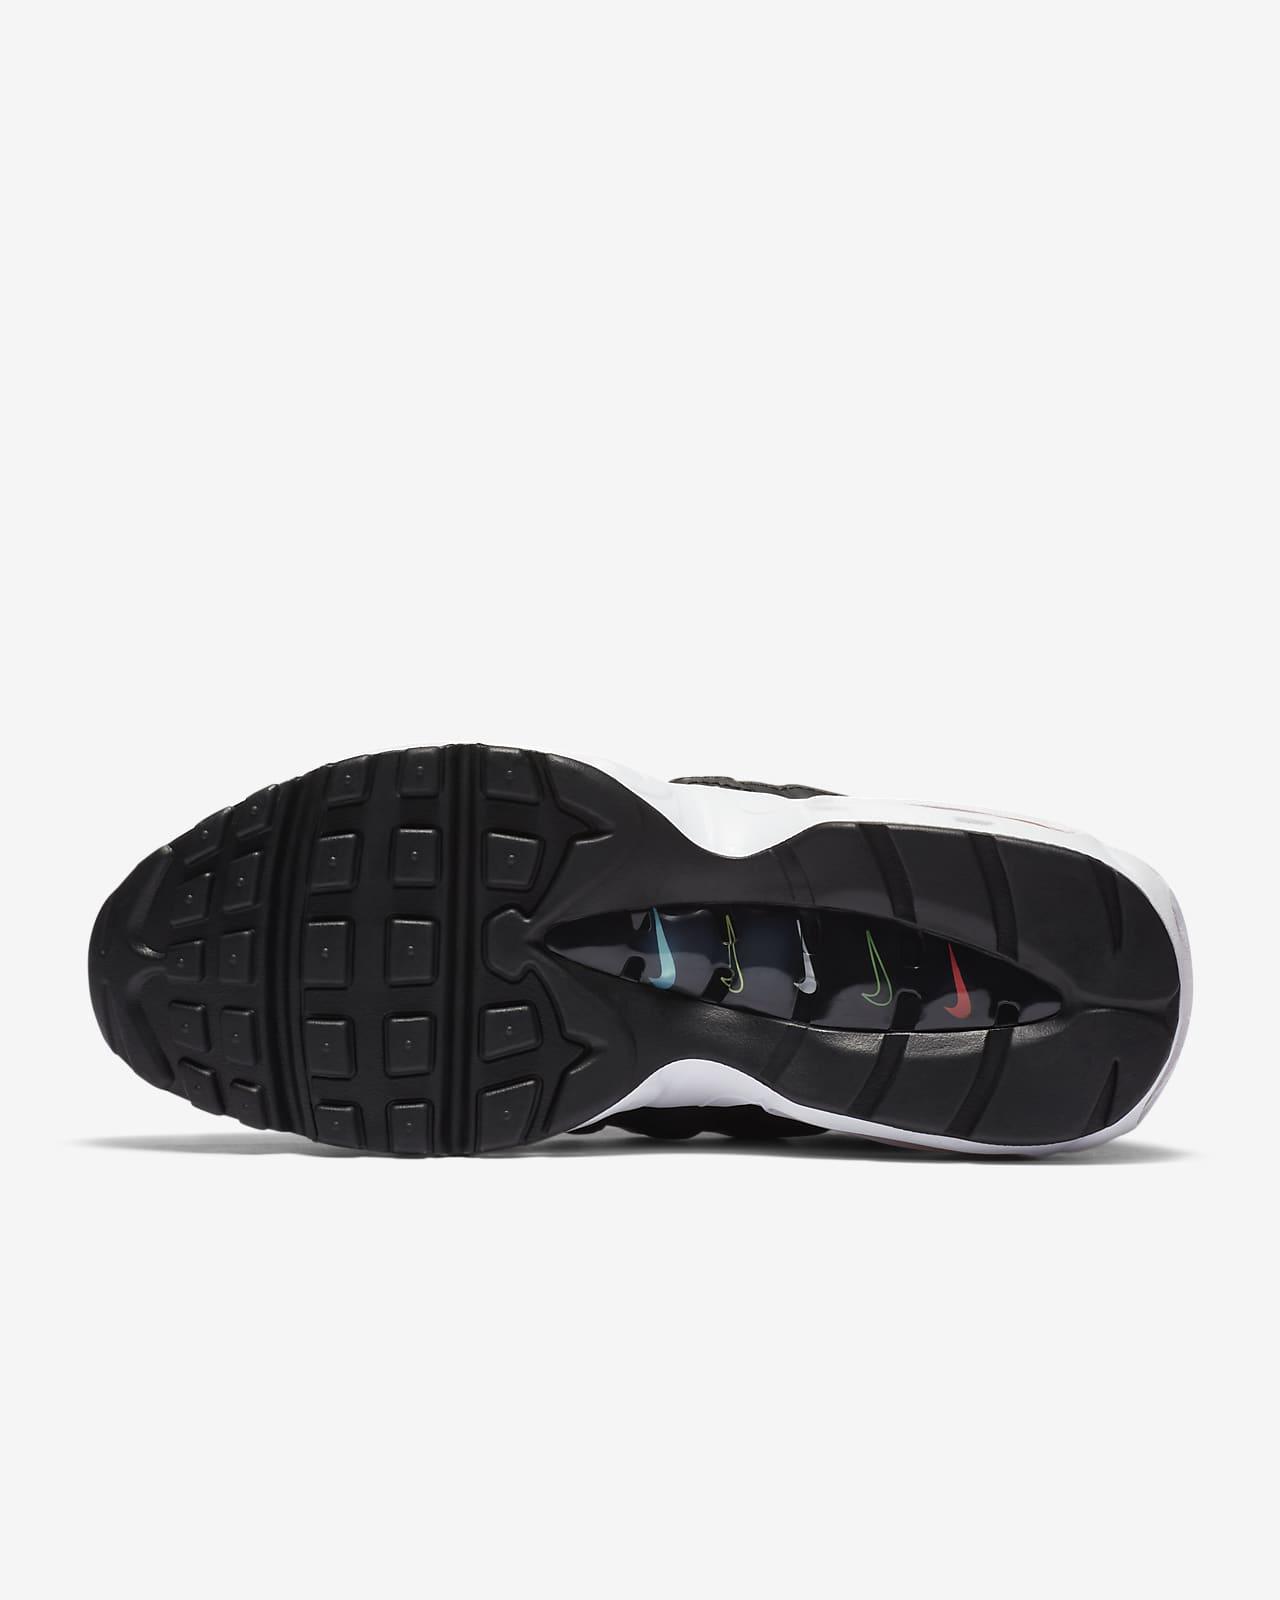 Nike Air Max 95 SE Women's Shoes. Nike LU